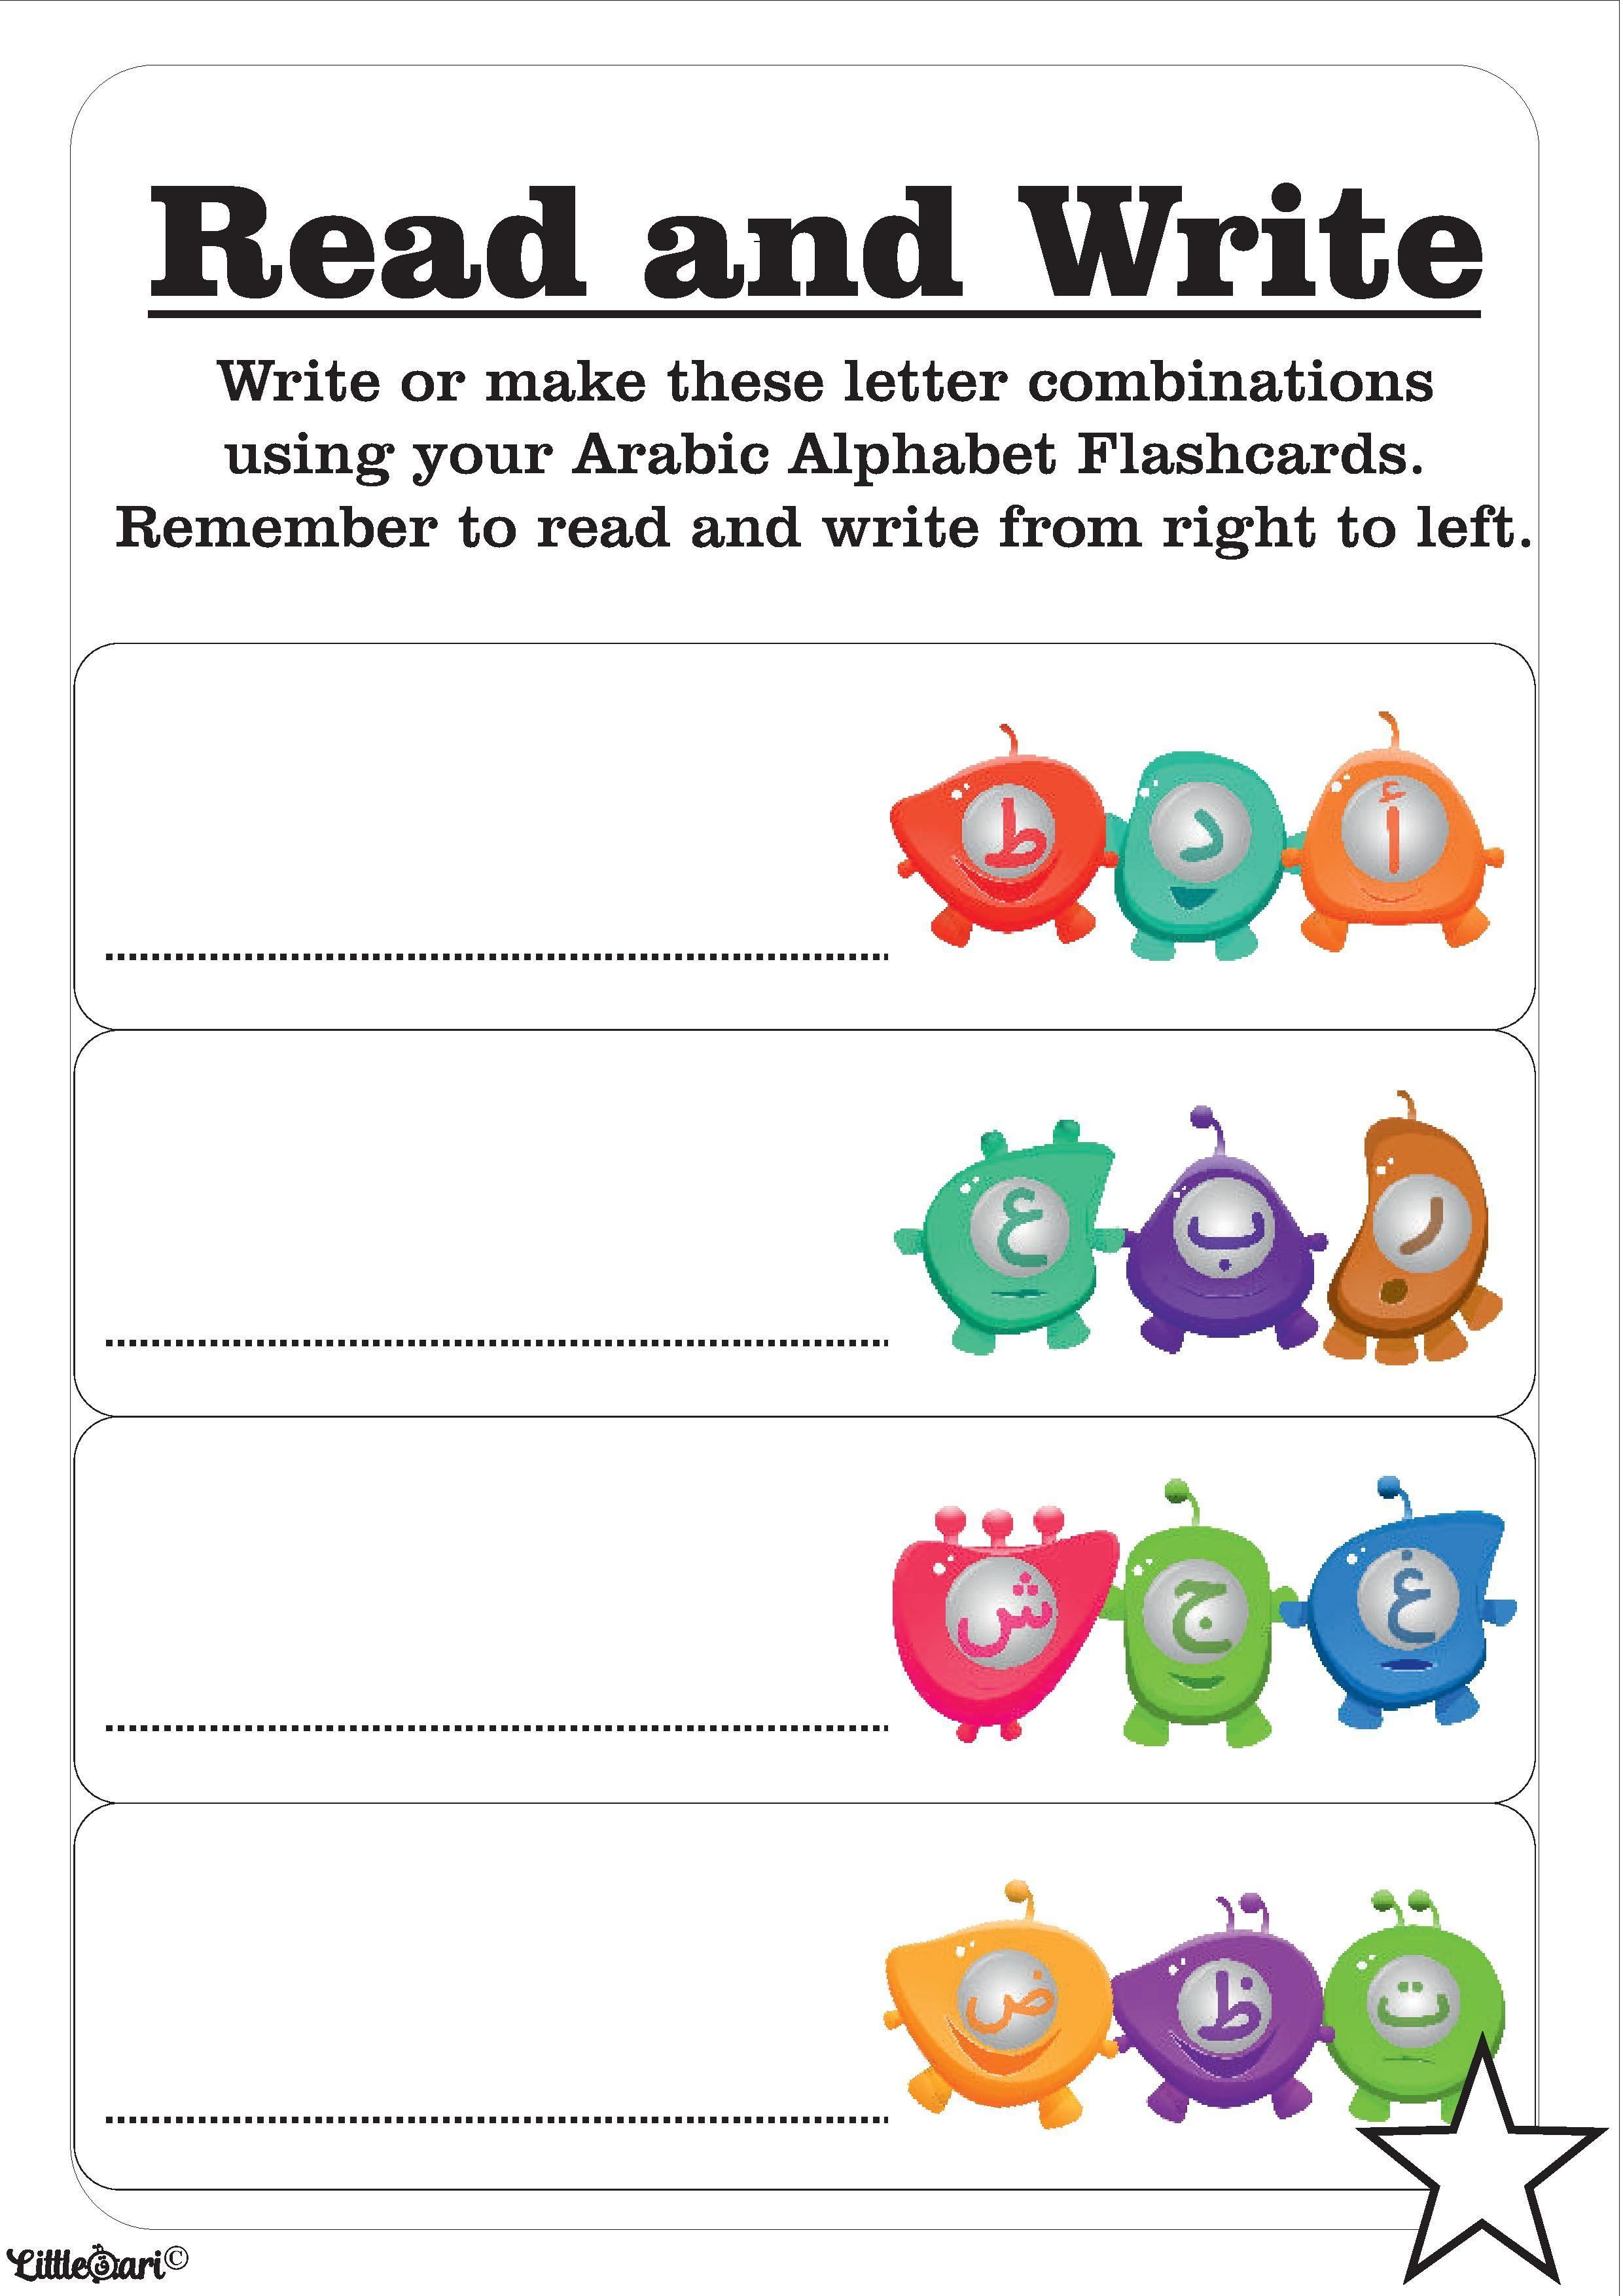 47 Summary Arabic Alphabet Littleqari Alphabet Flashcards Reading Writing Book Activities [ 3508 x 2480 Pixel ]